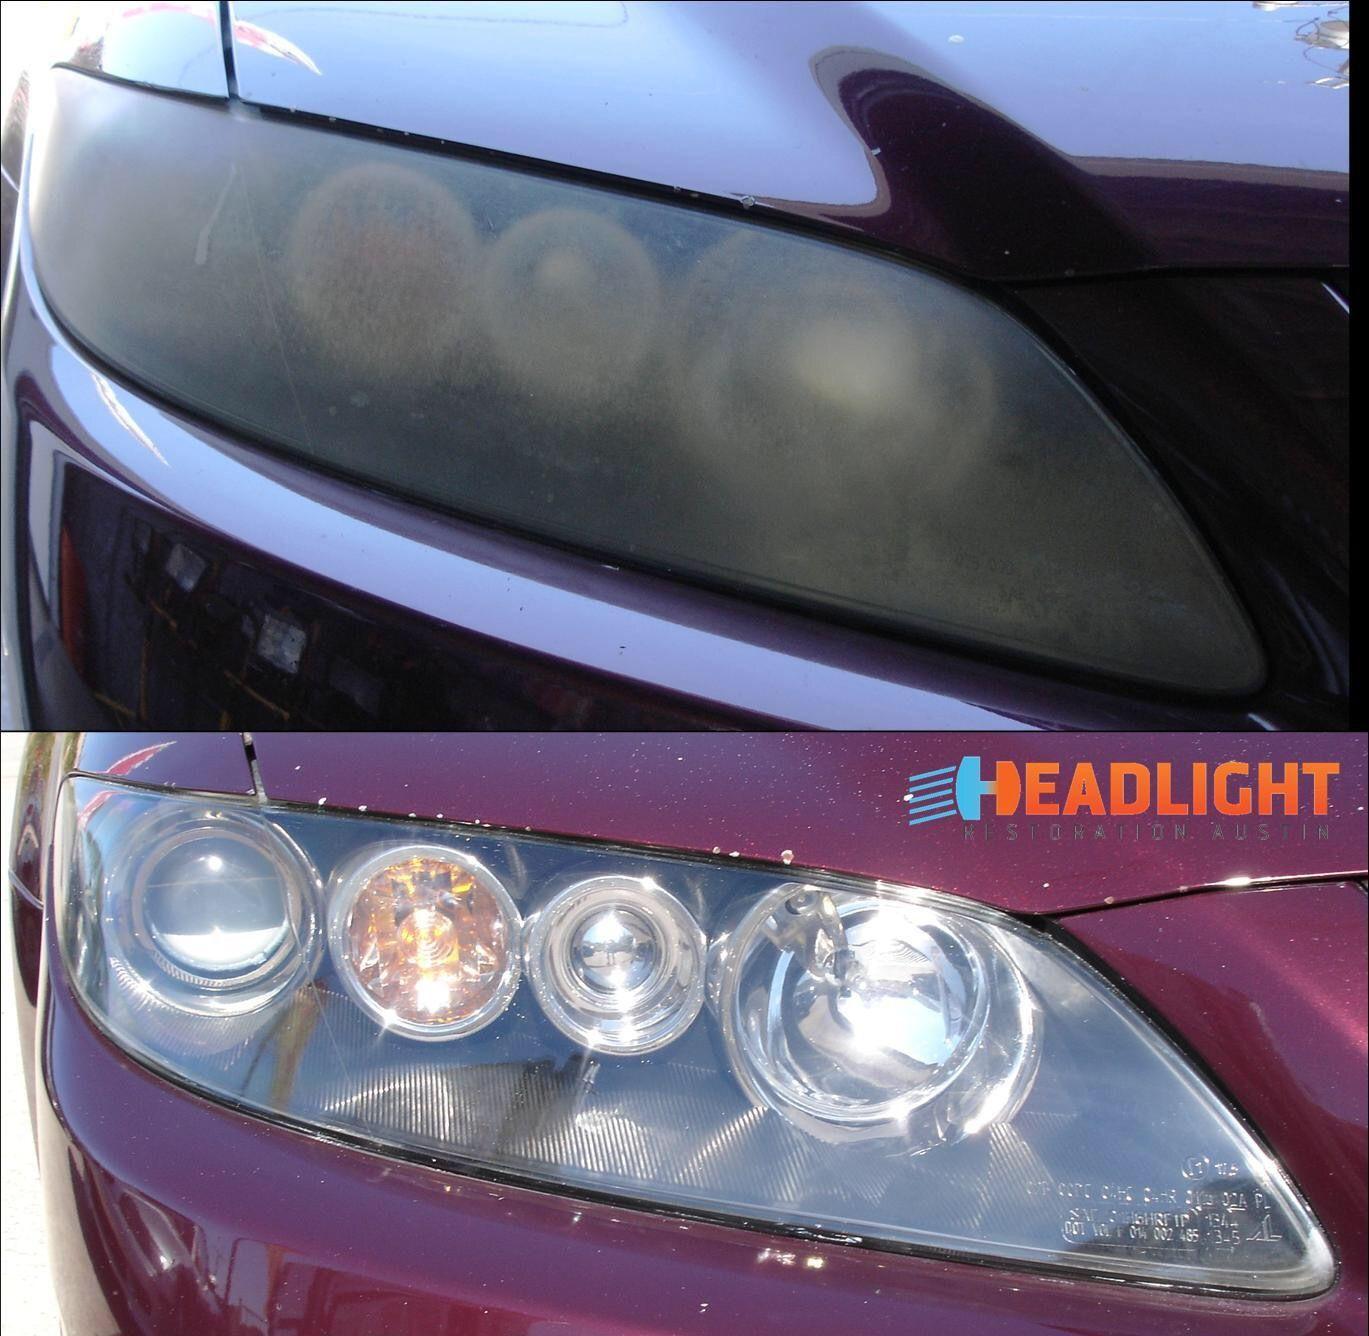 Pin by Auto Detailing Austin on Headlight Restoration